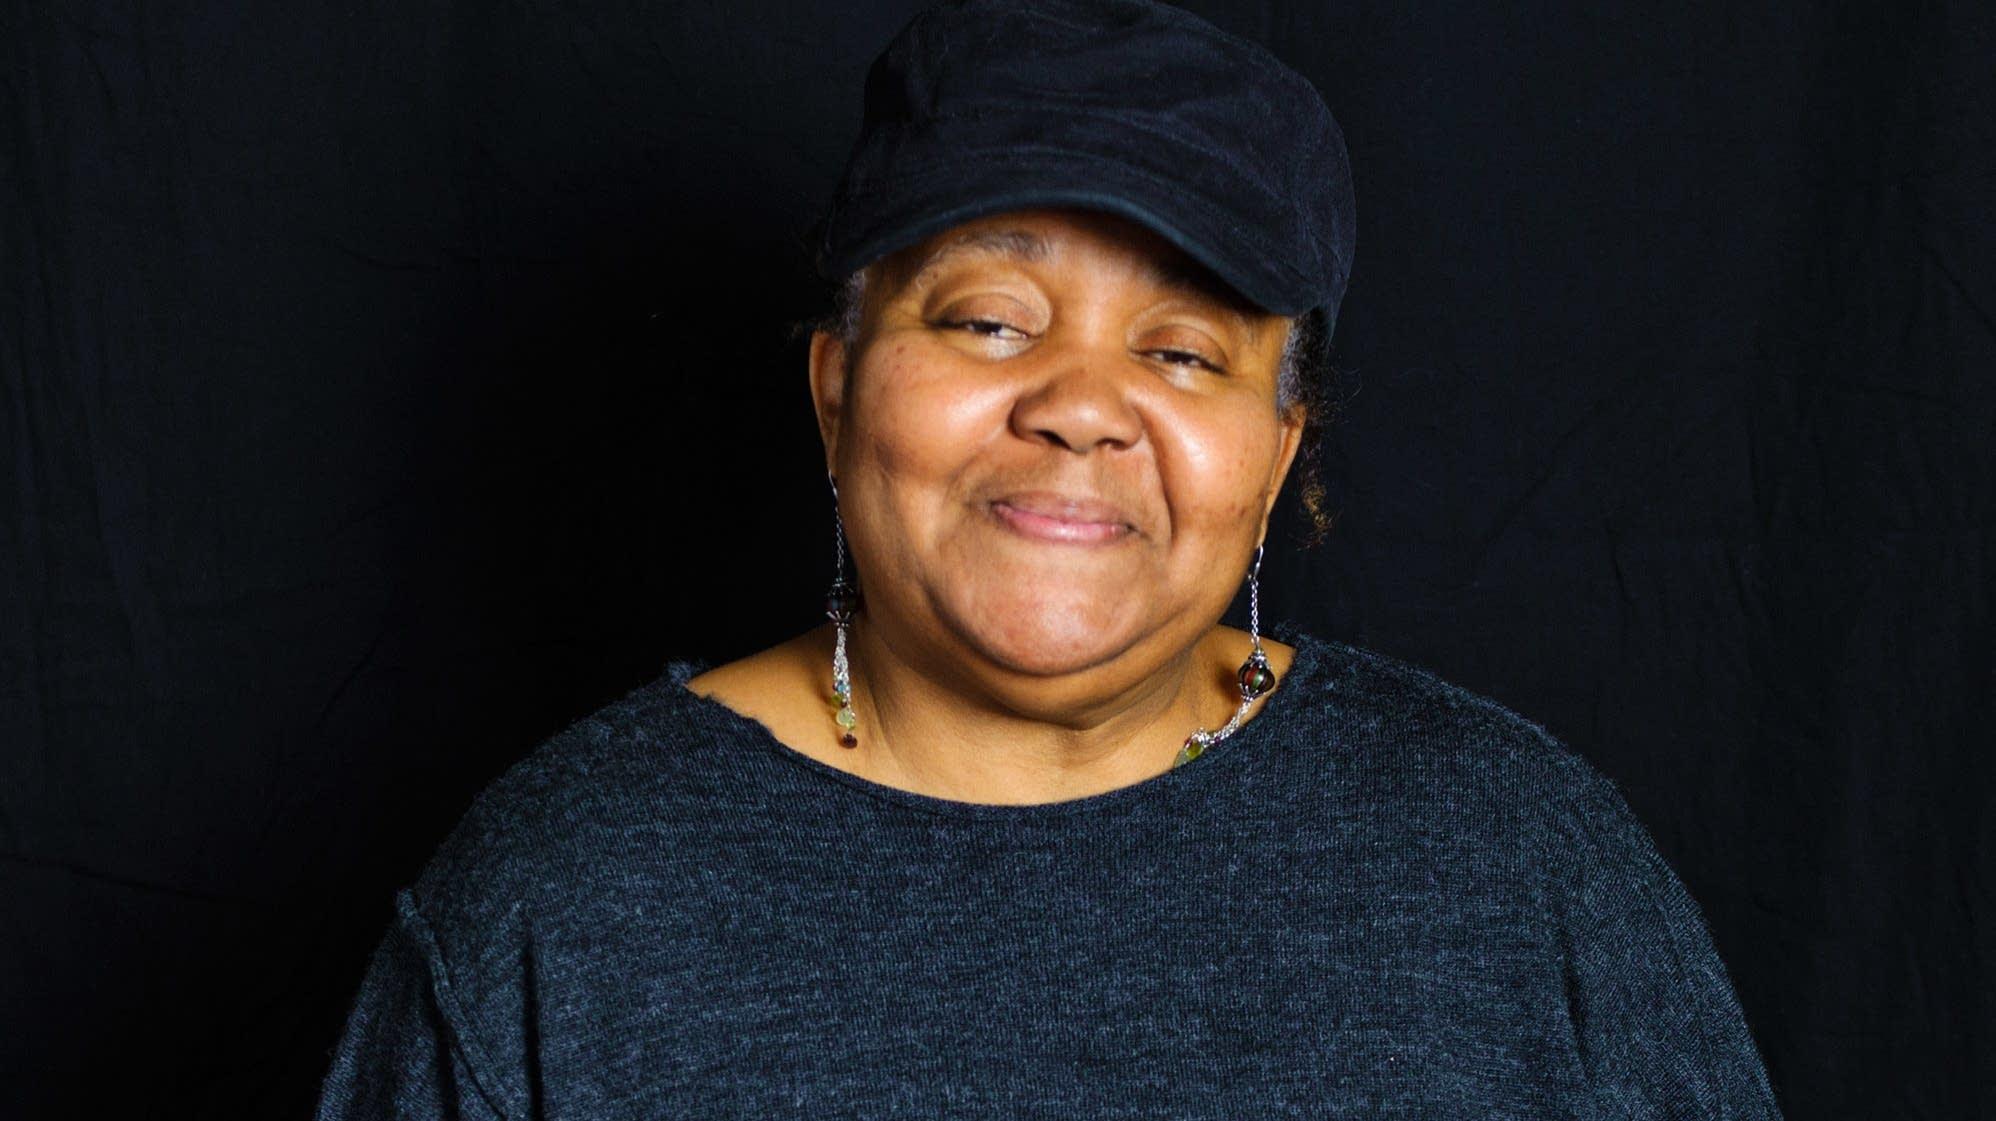 Composer Renee Baker